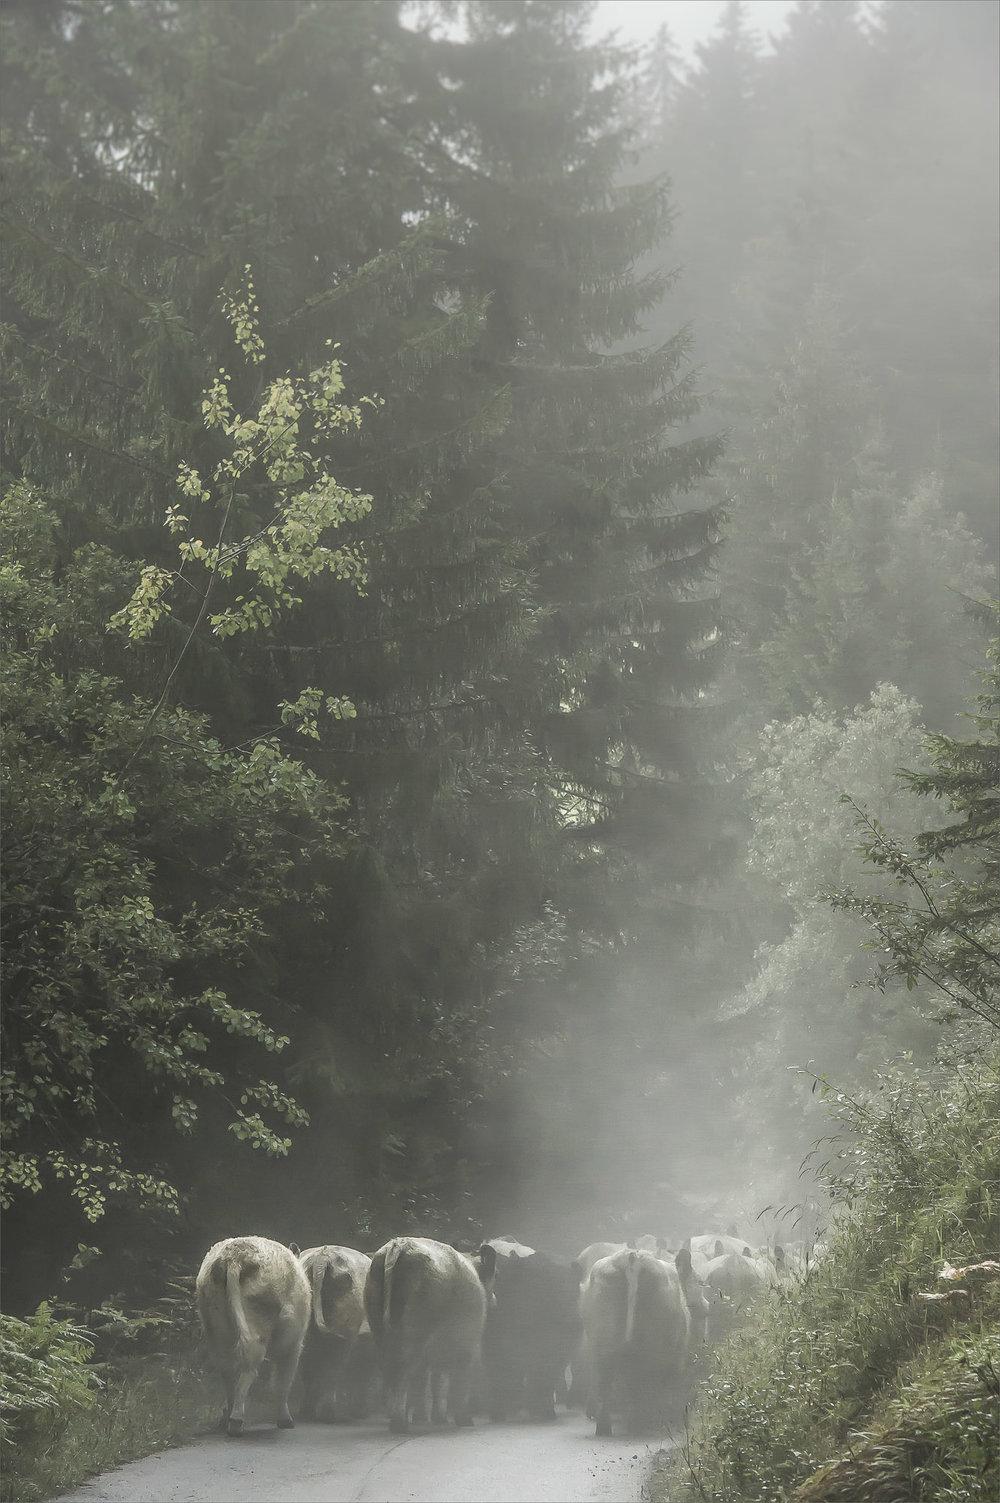 Alpabtrieb Wald #/10 fine art print Hahnemühle bis 120cm x 180cm